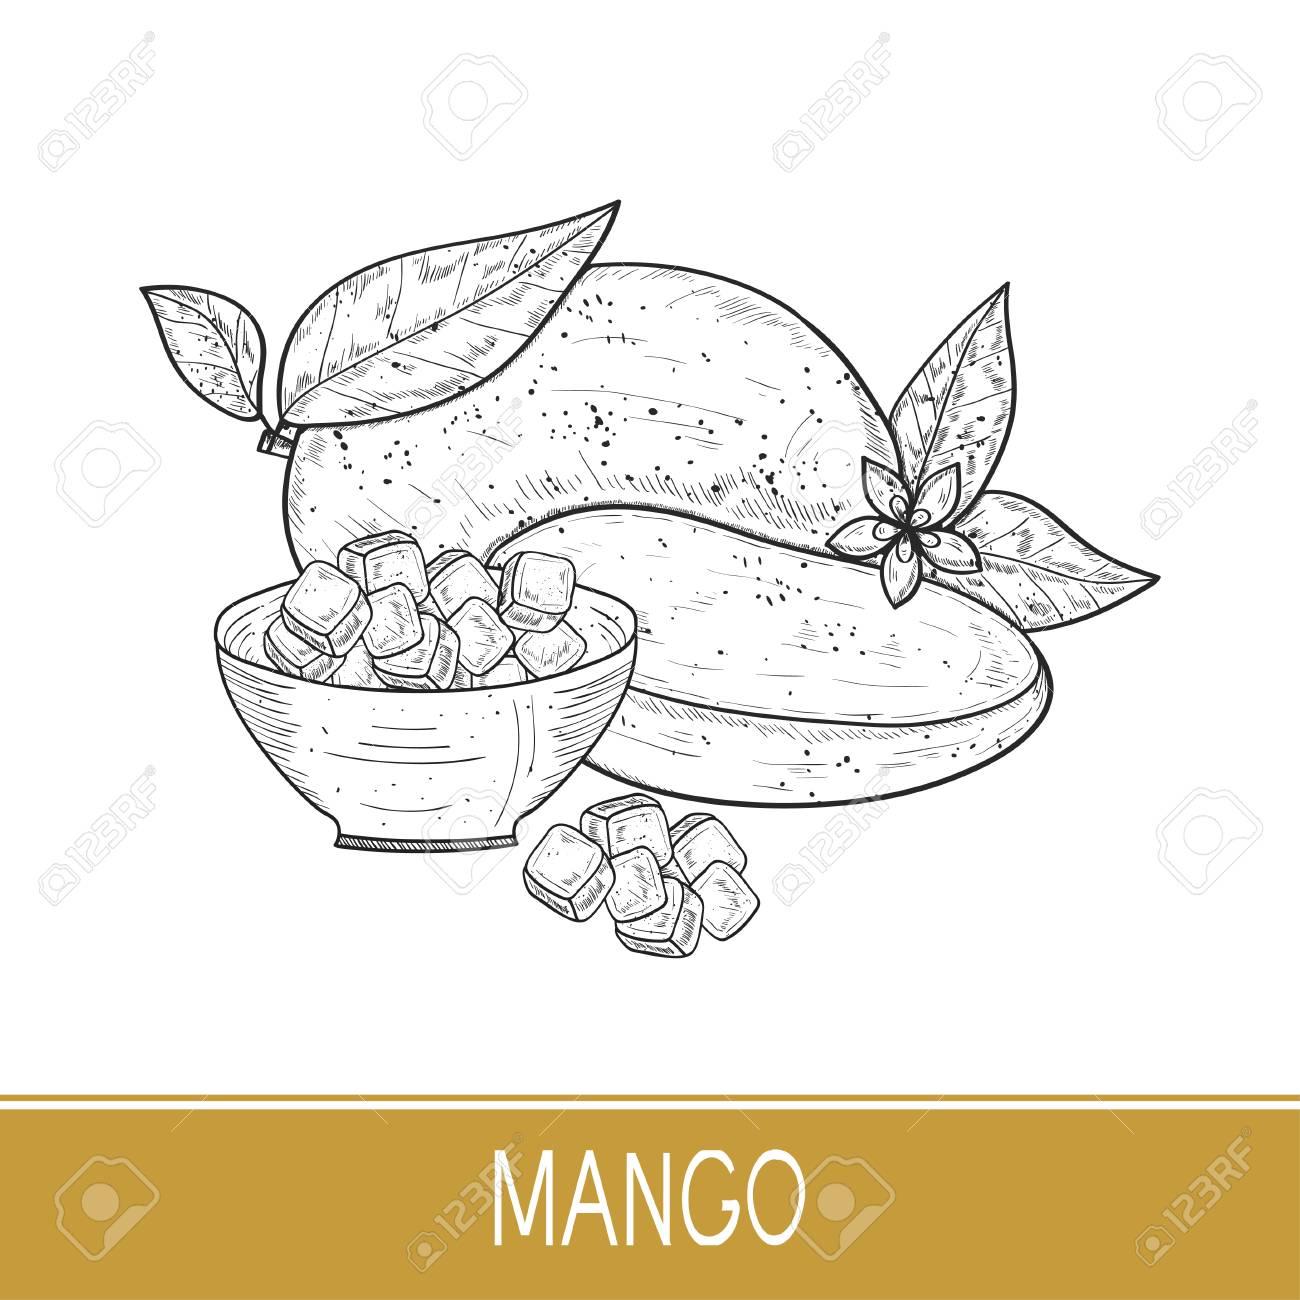 Mango a whole fruit a piece a slice a flower bowl